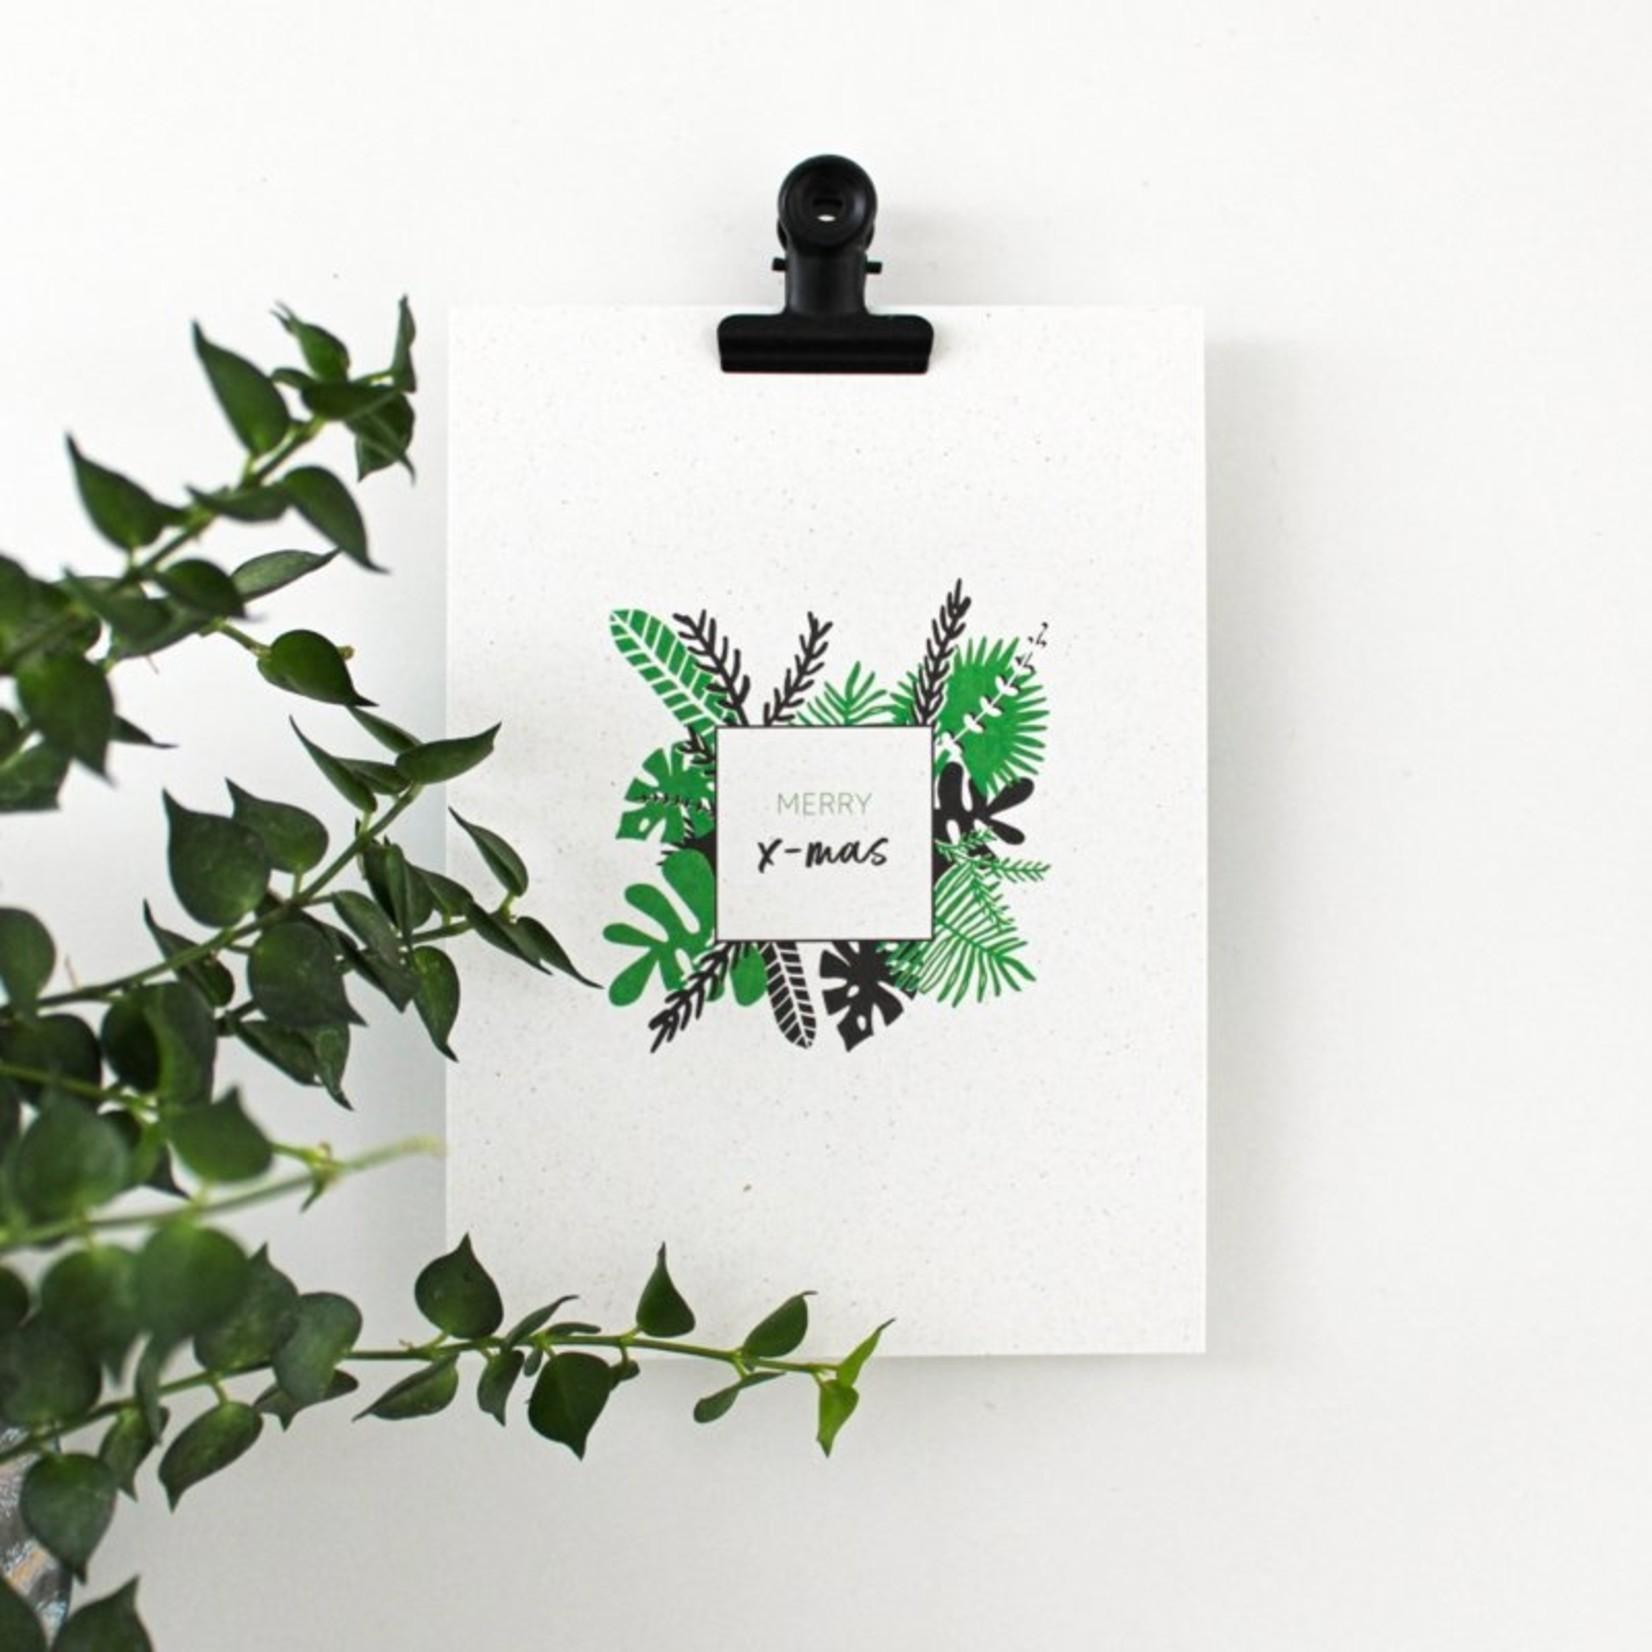 Postkaart - Merry X-mas